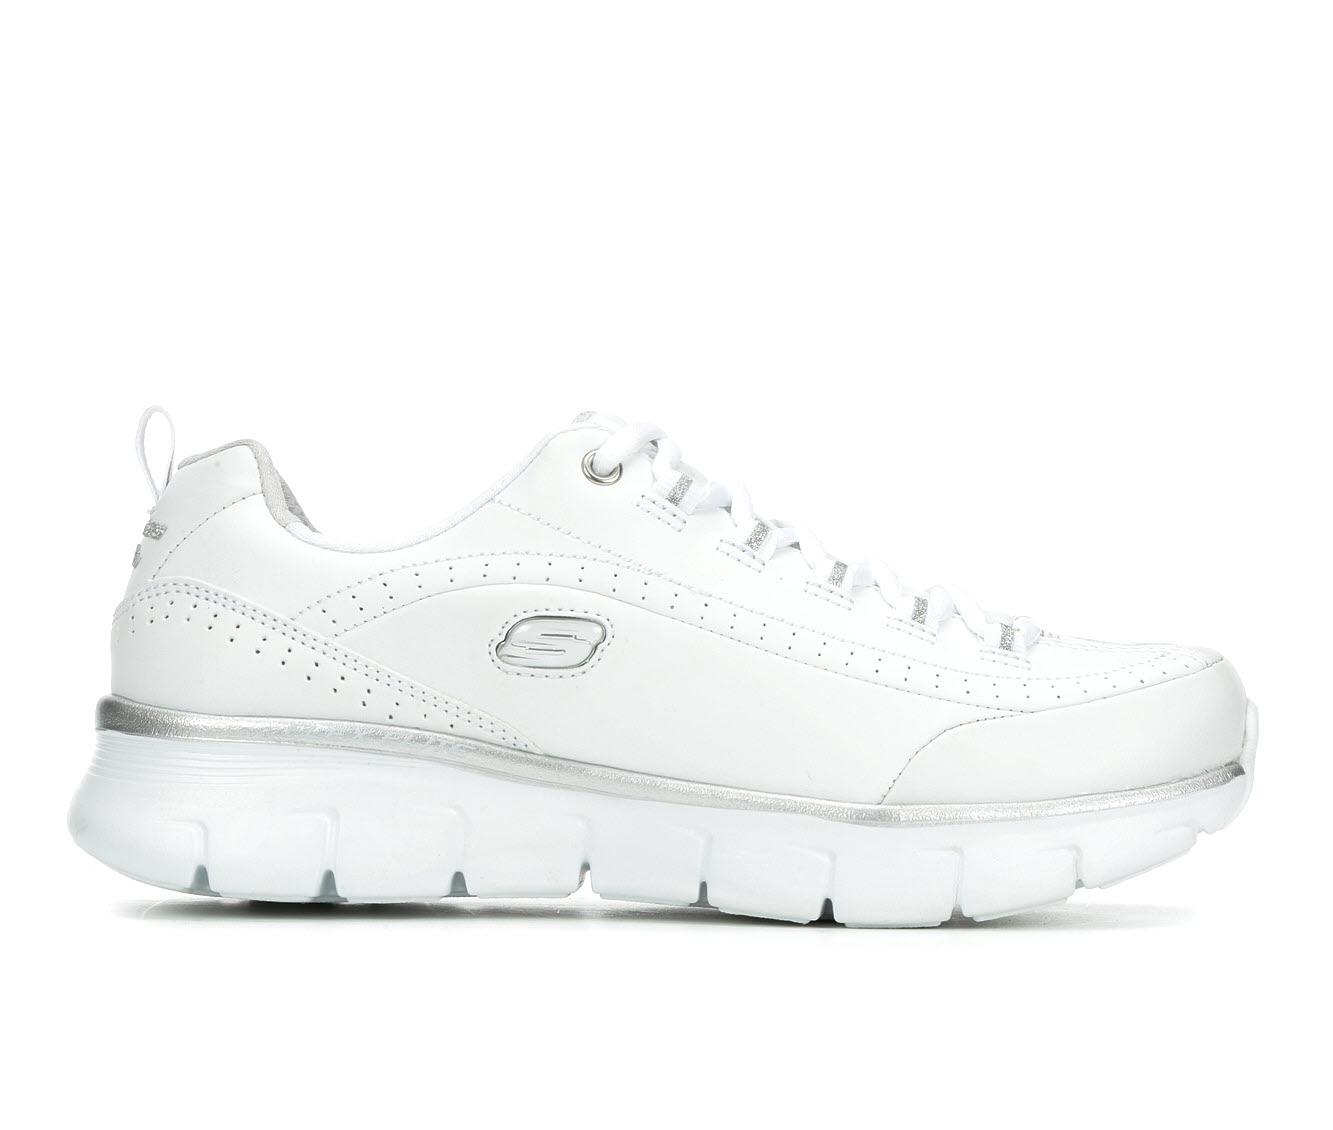 Skechers Synergy 3.0 Women's Athletic Shoe (White)